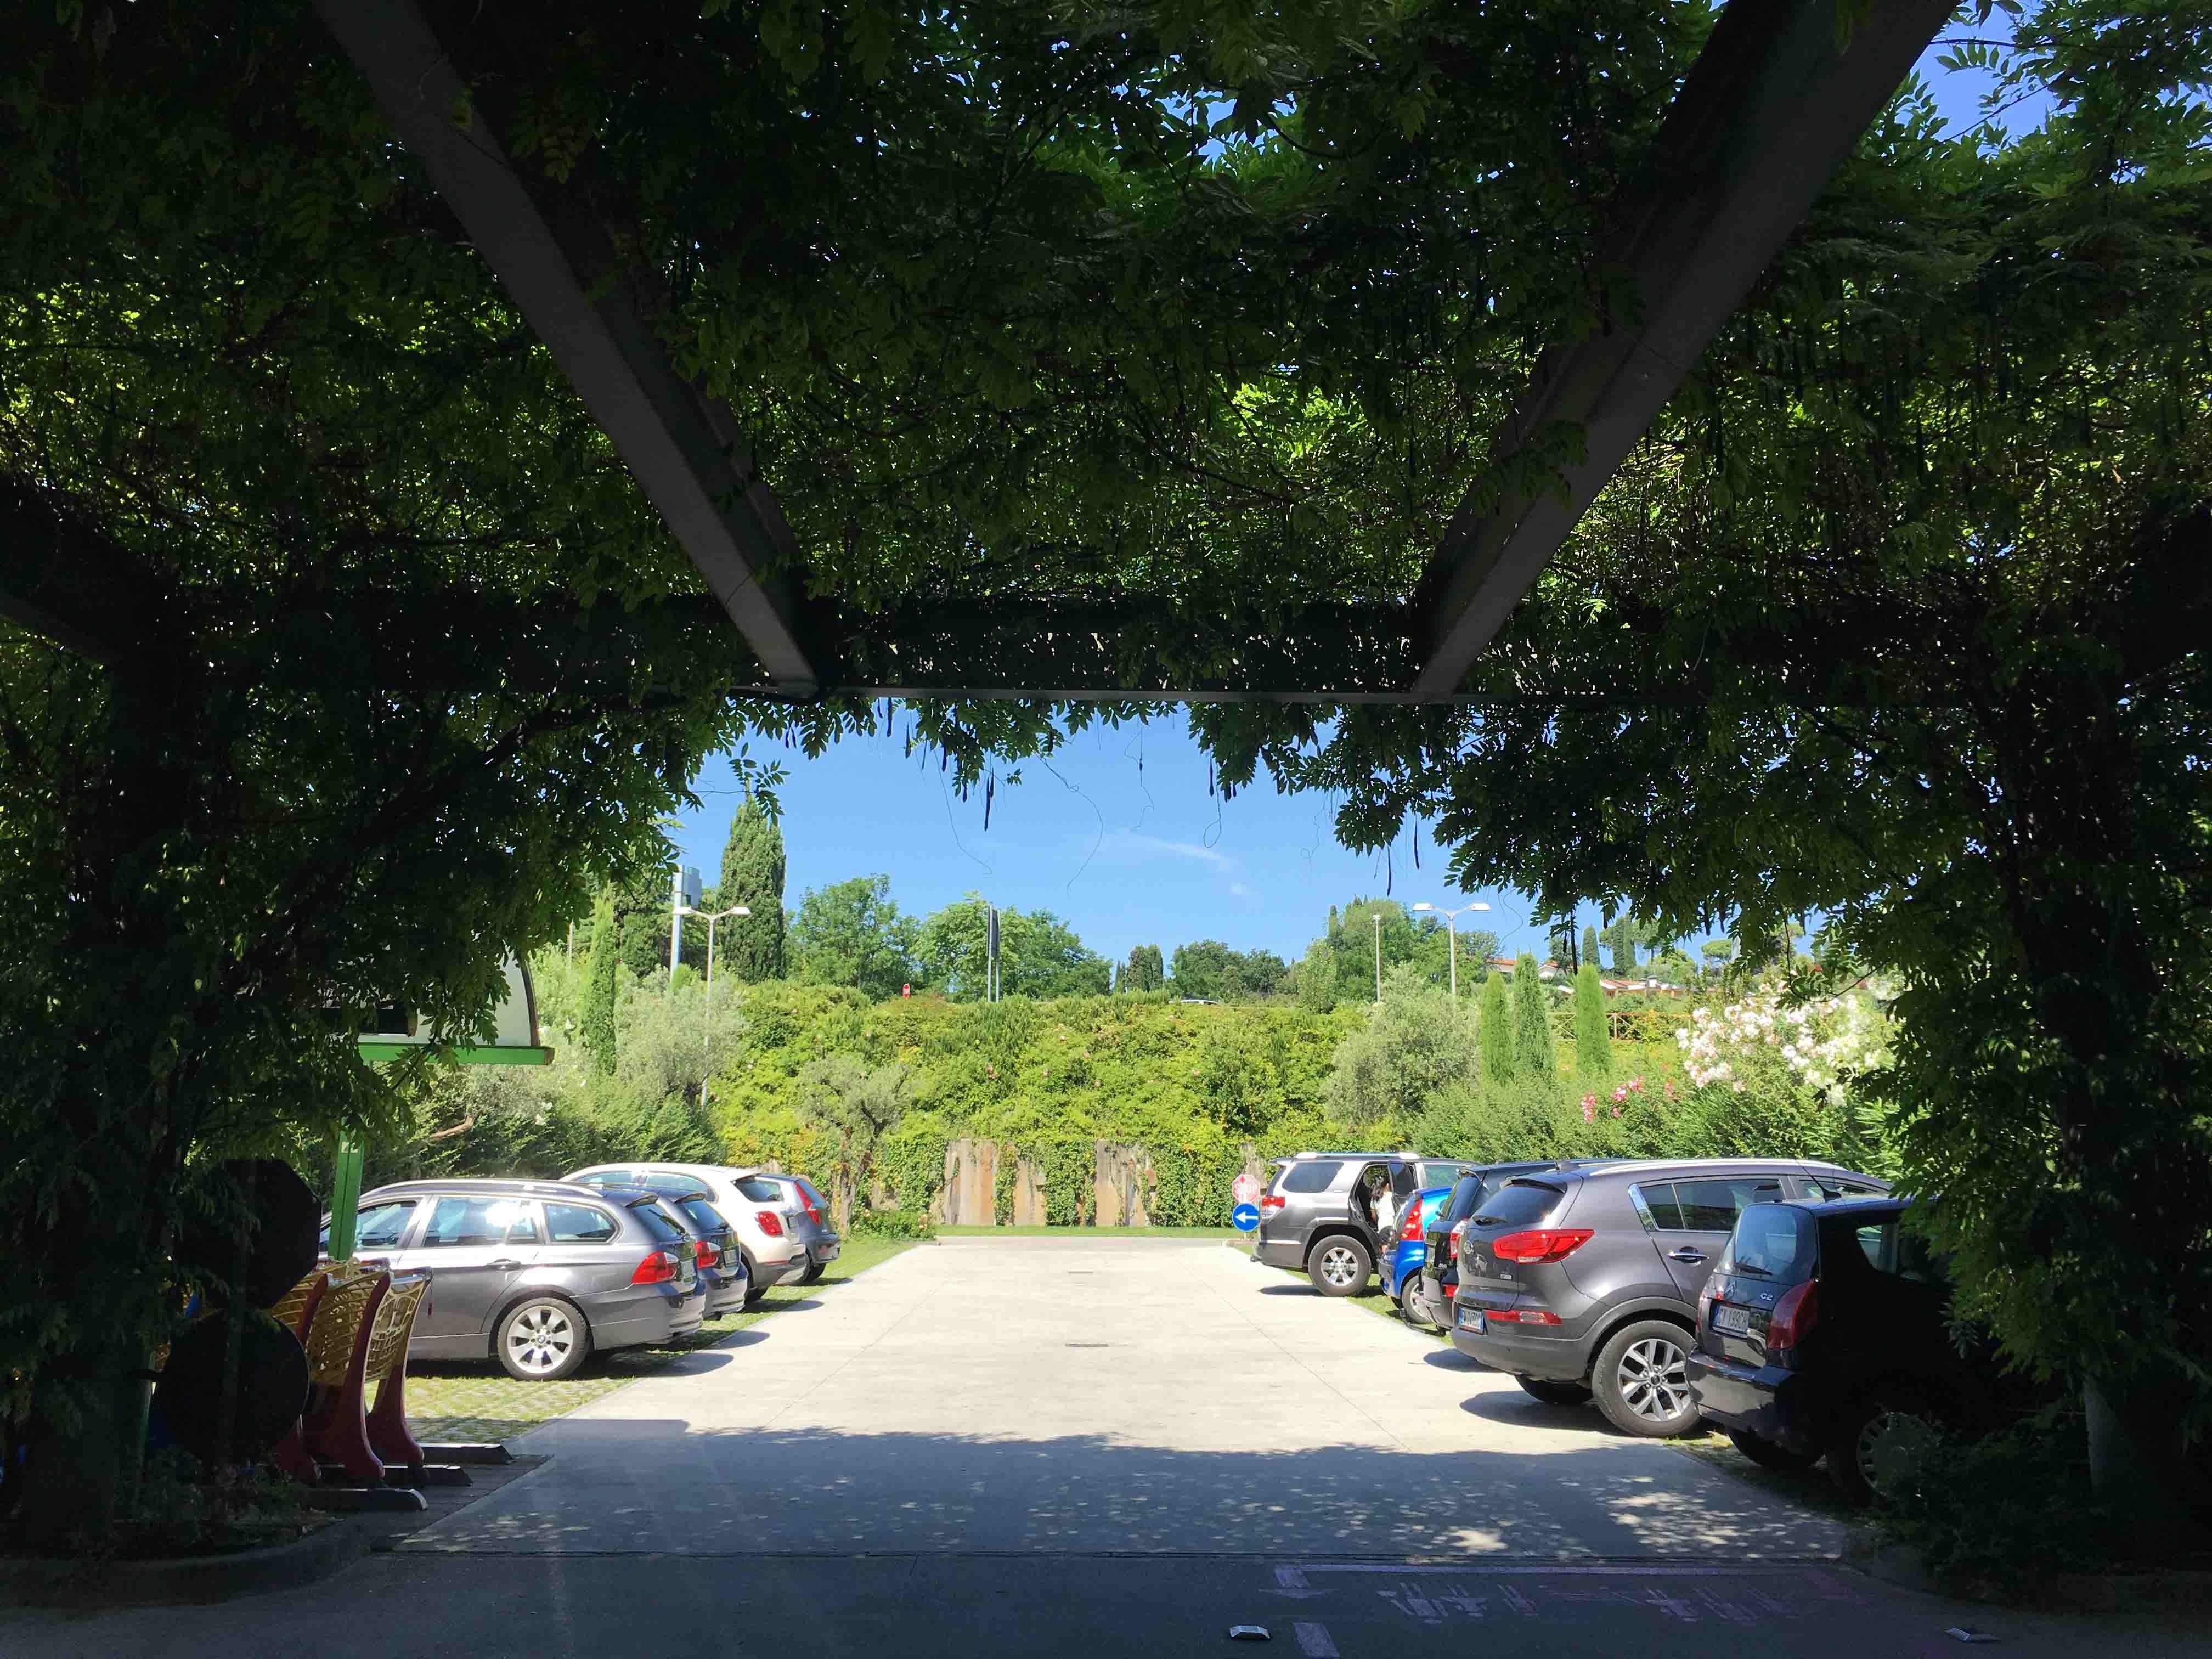 Le Vele - Desenzano del Garda - ТОРГОВЫЕ ЦЕНТРЫ